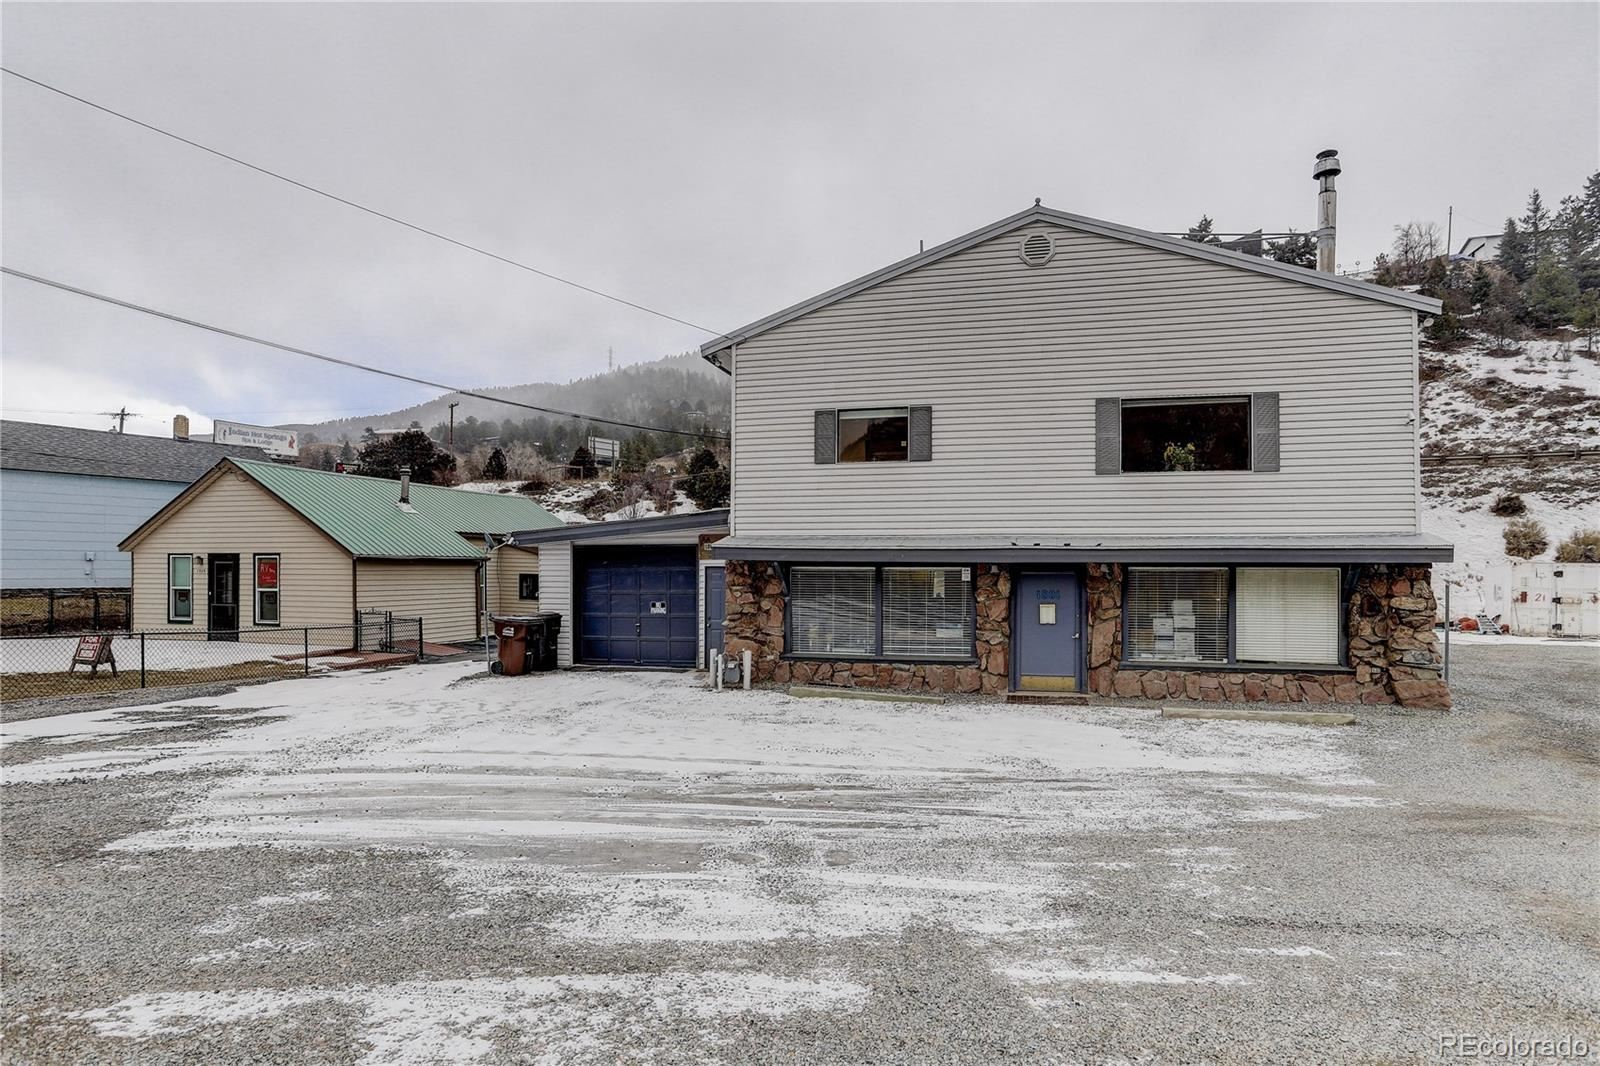 1801 Miner Street, Idaho Springs, CO 80452 - #: 5578642